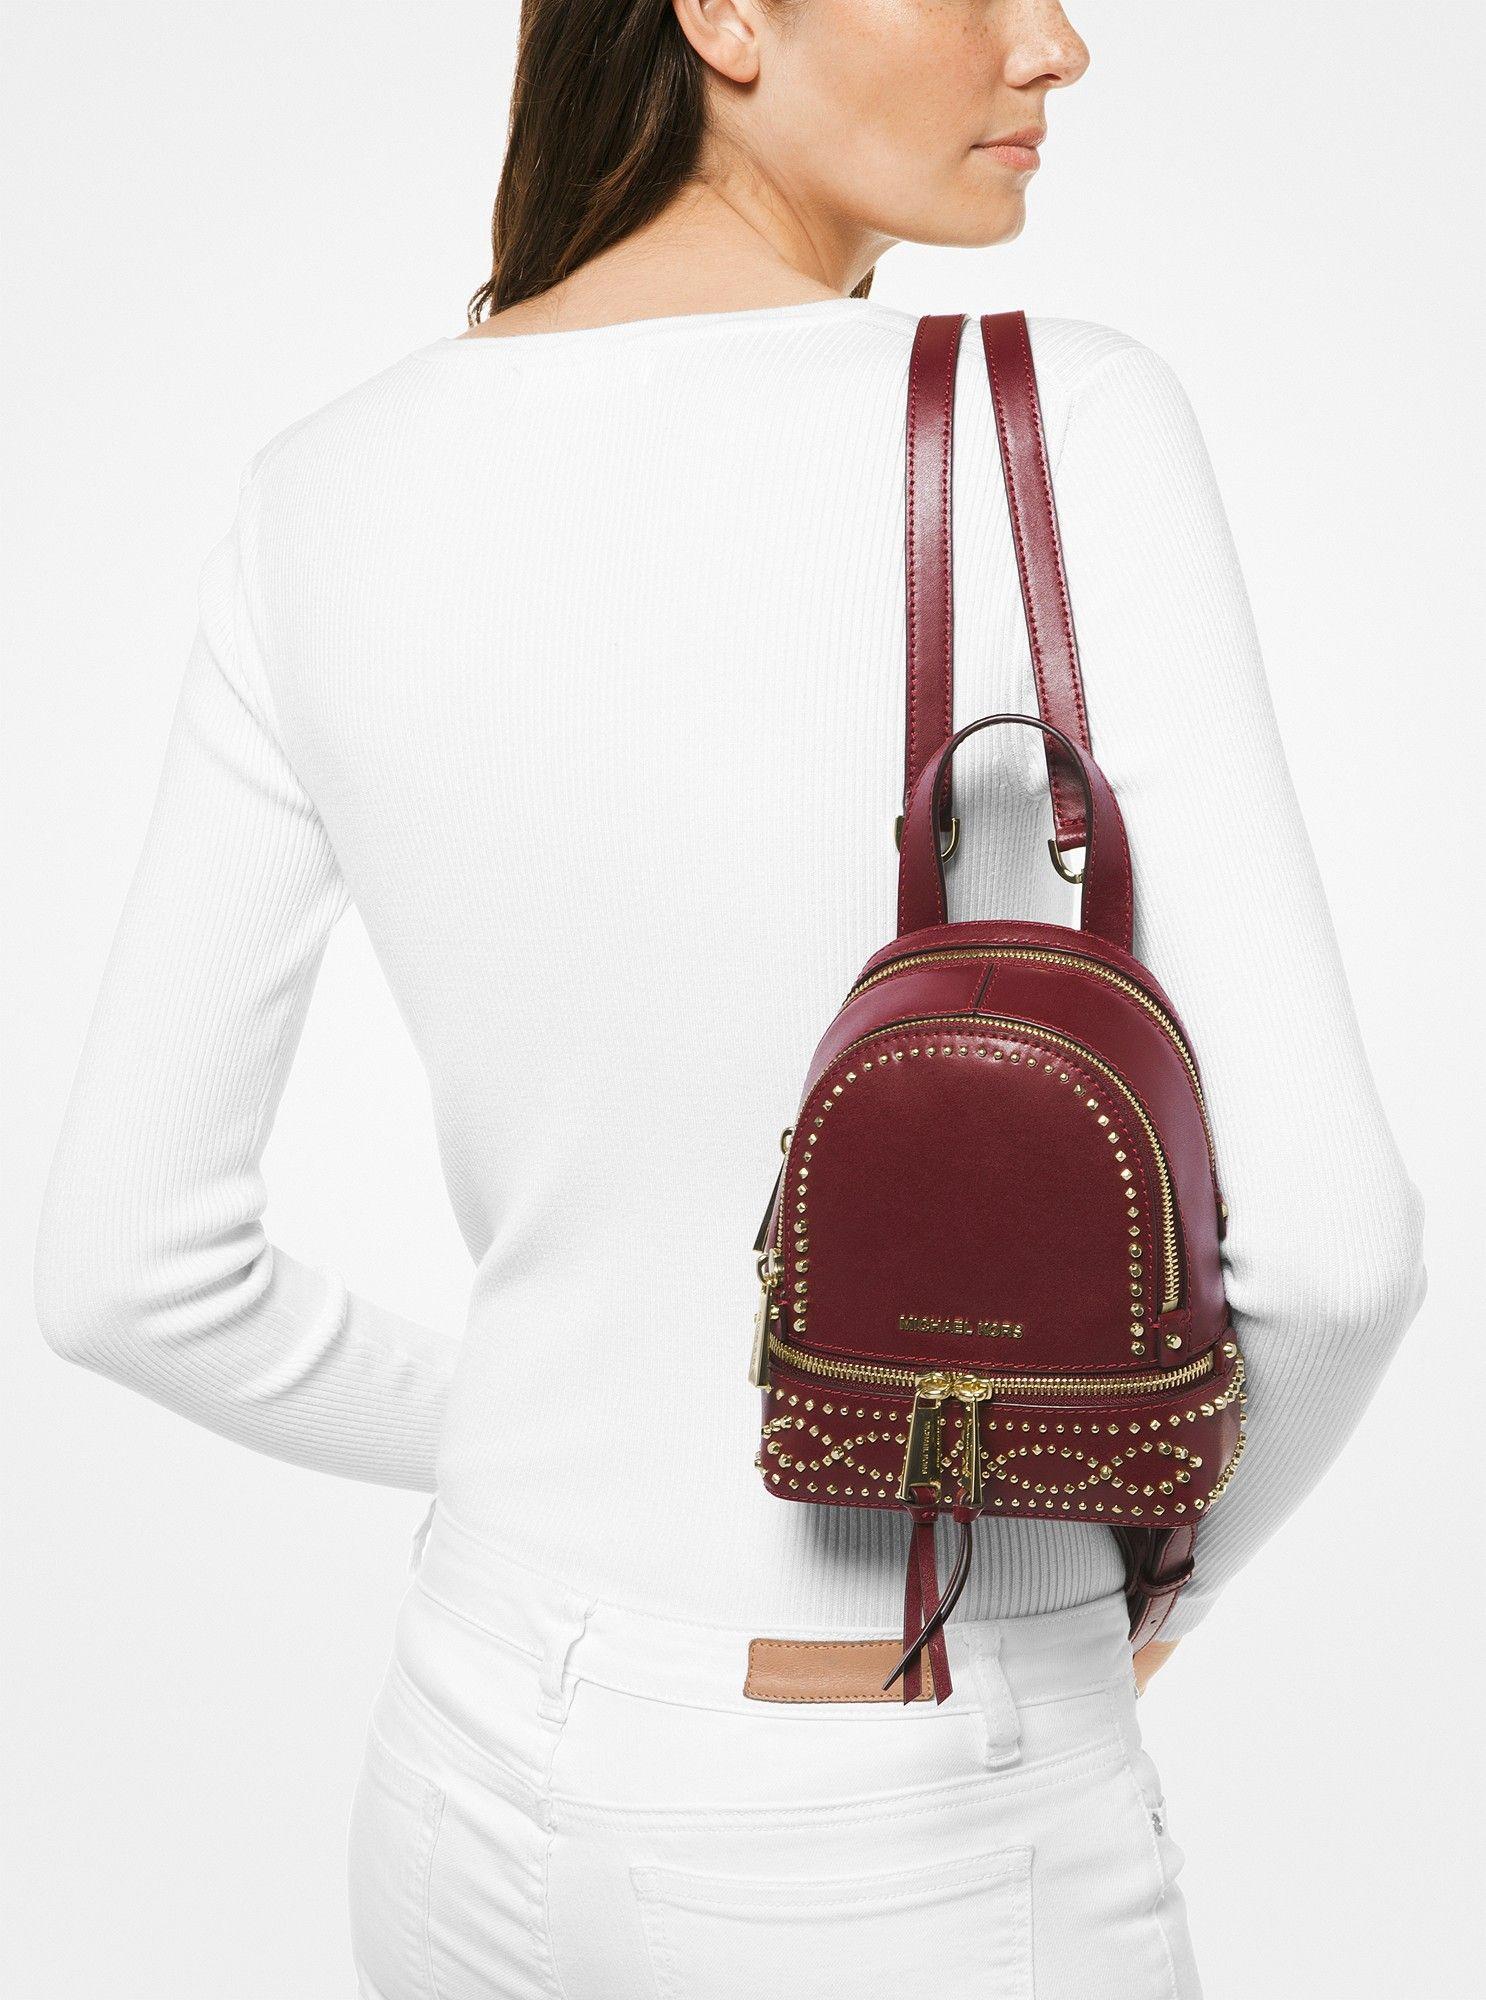 54e54d29c1c5 Michael Kors Rhea Mini Studded Leather Backpack - Oxblood | Products ...